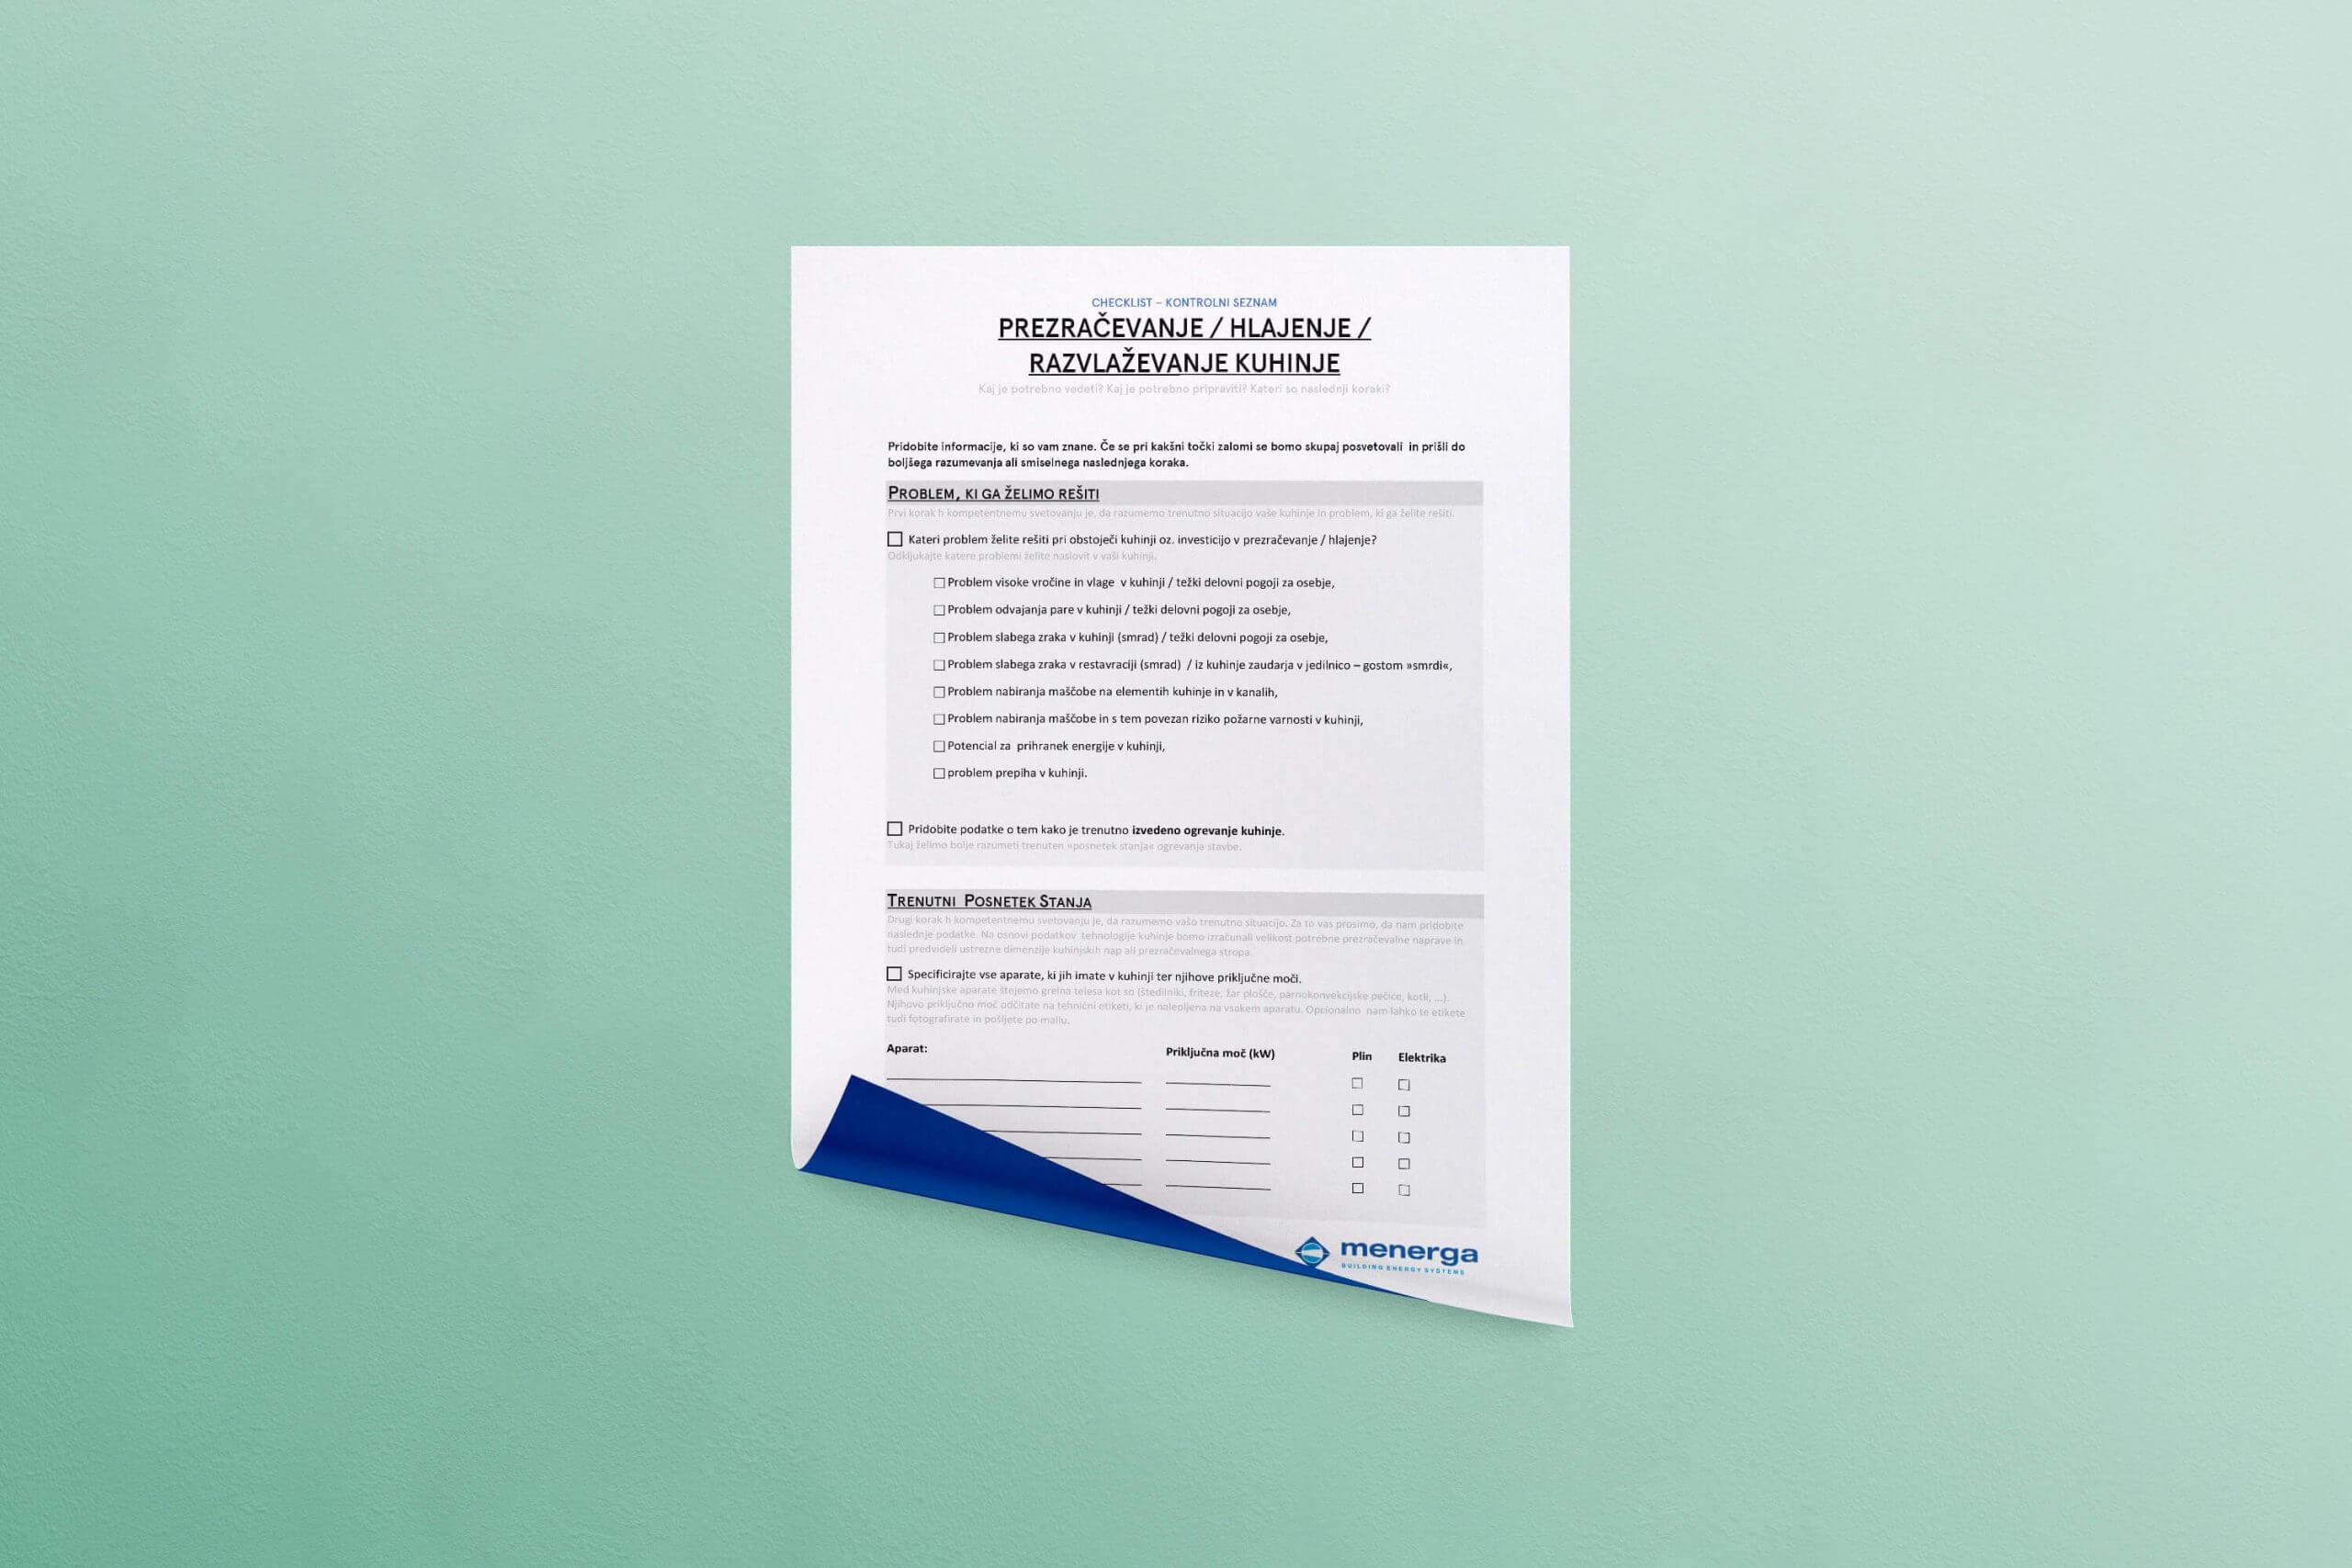 vodic-checklista-ventilacija-kuhinje-restorana-hr